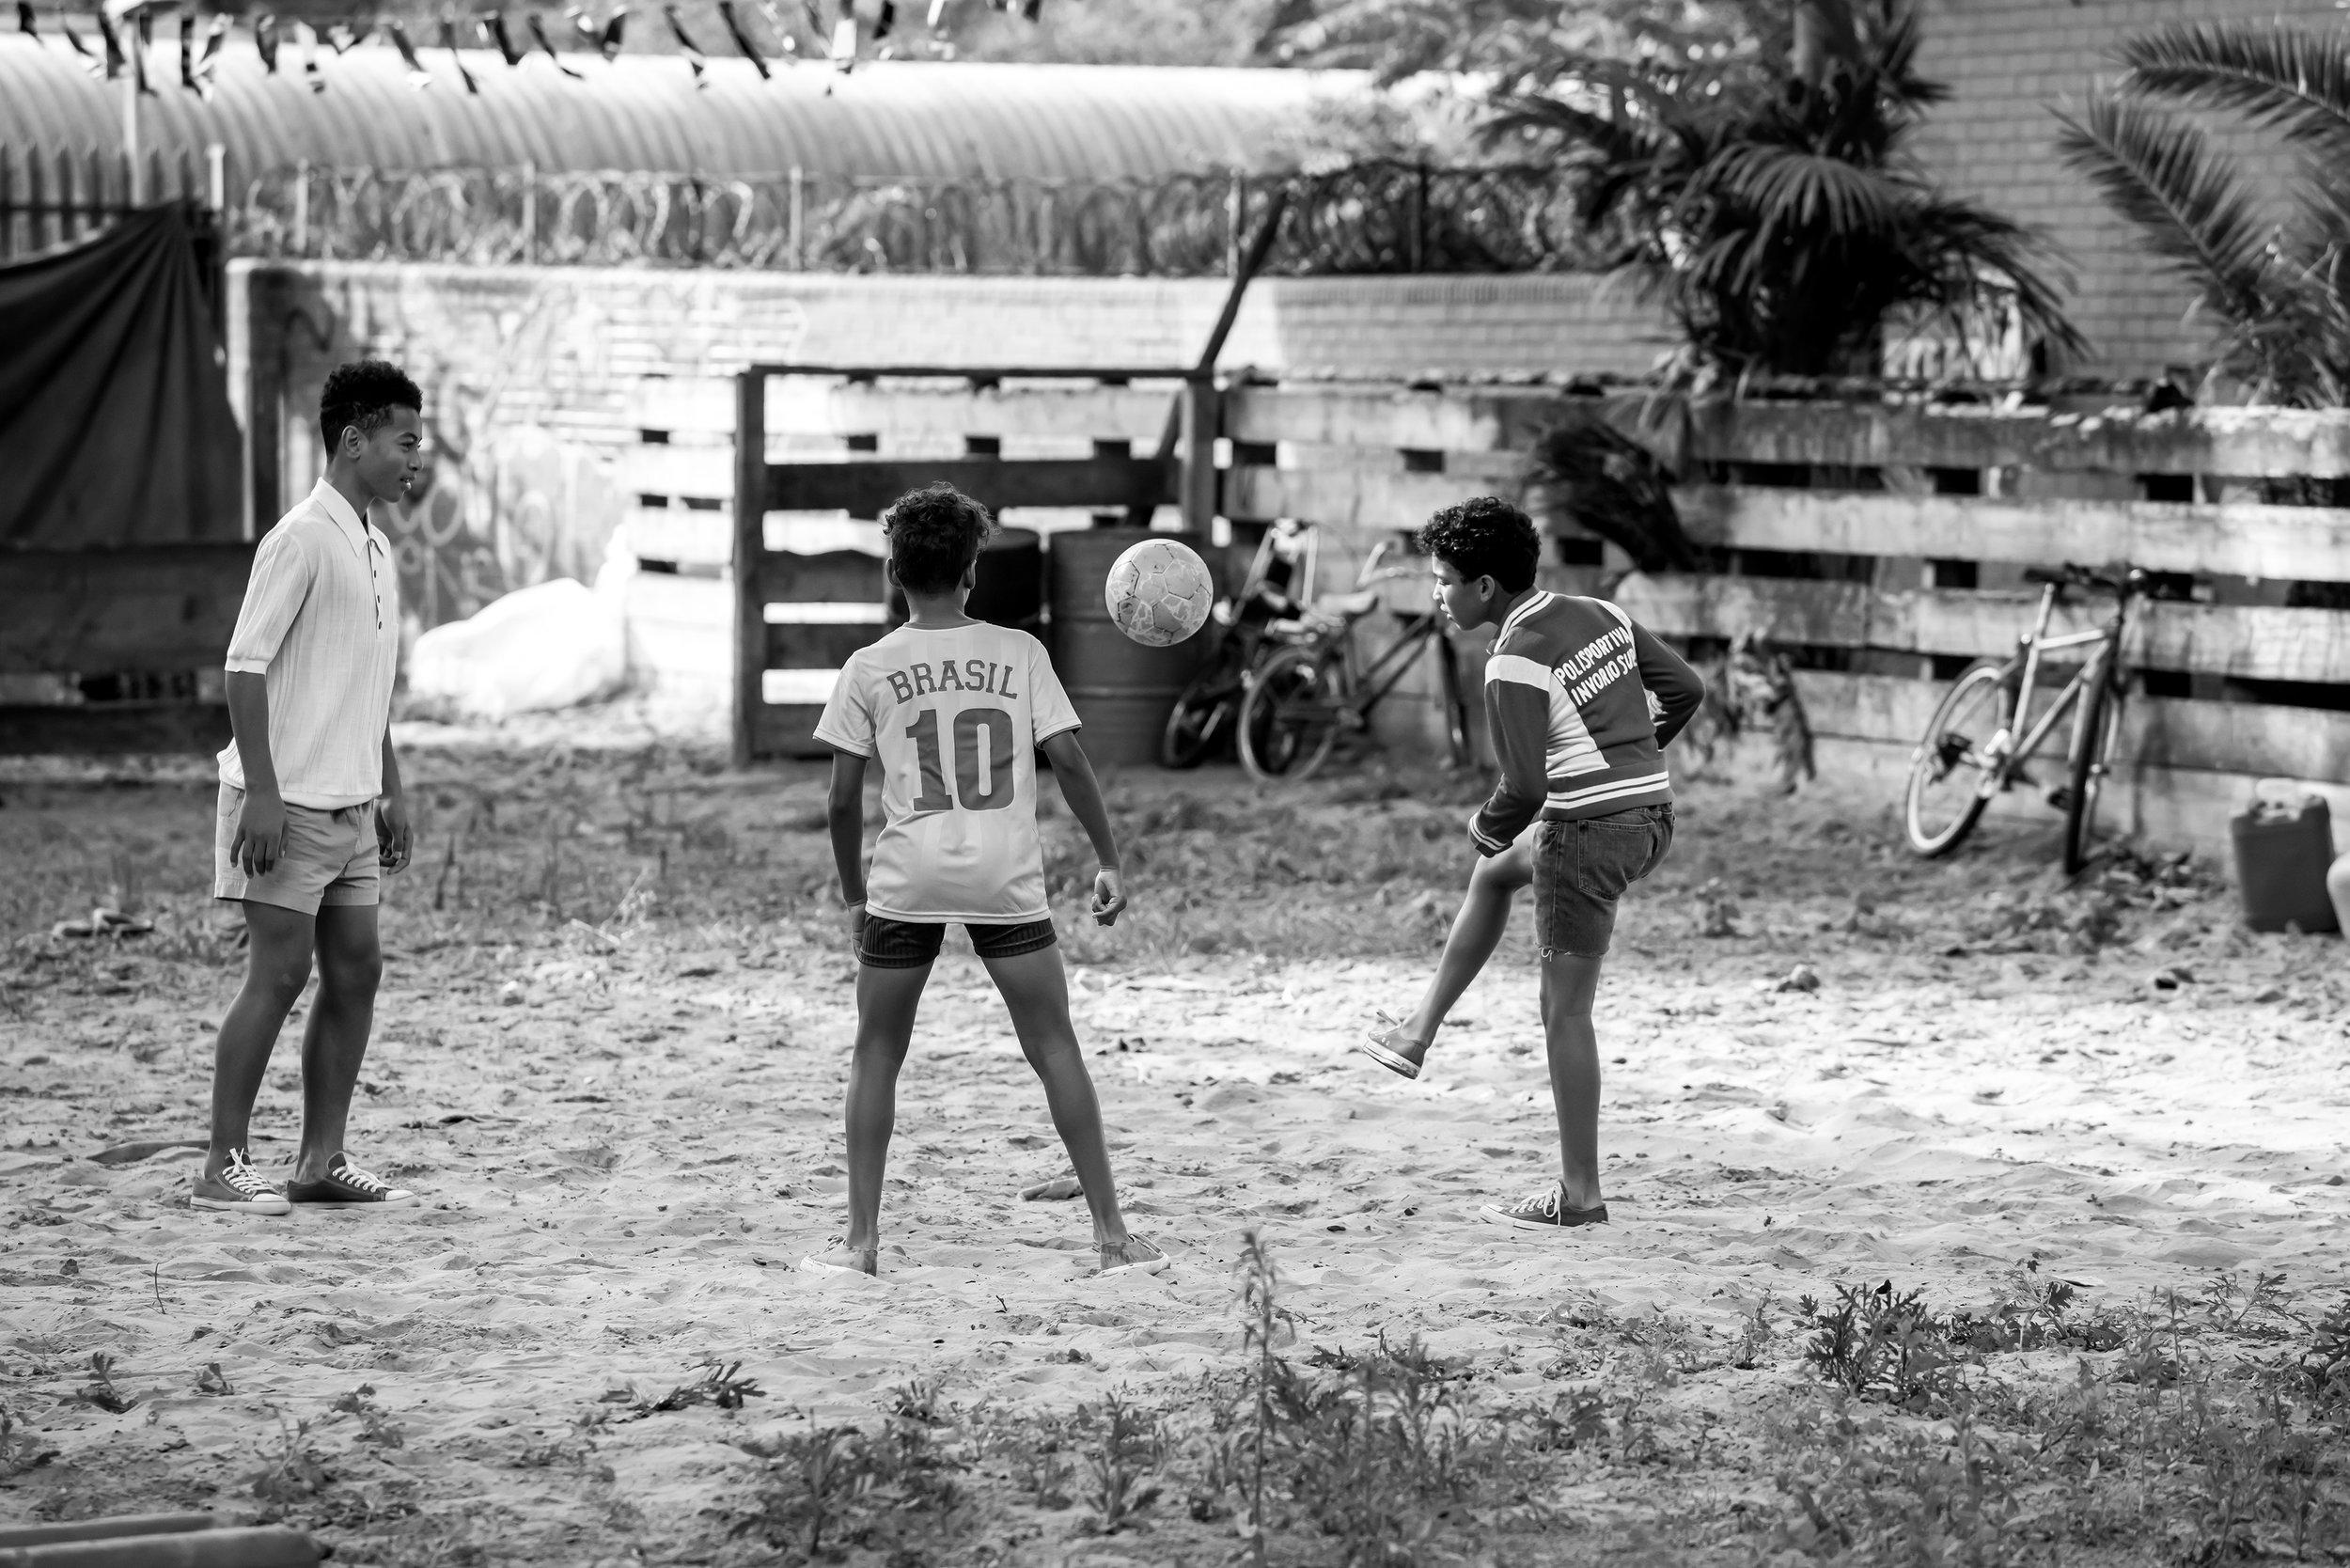 Hugo Boss United - Kids Brazil playing